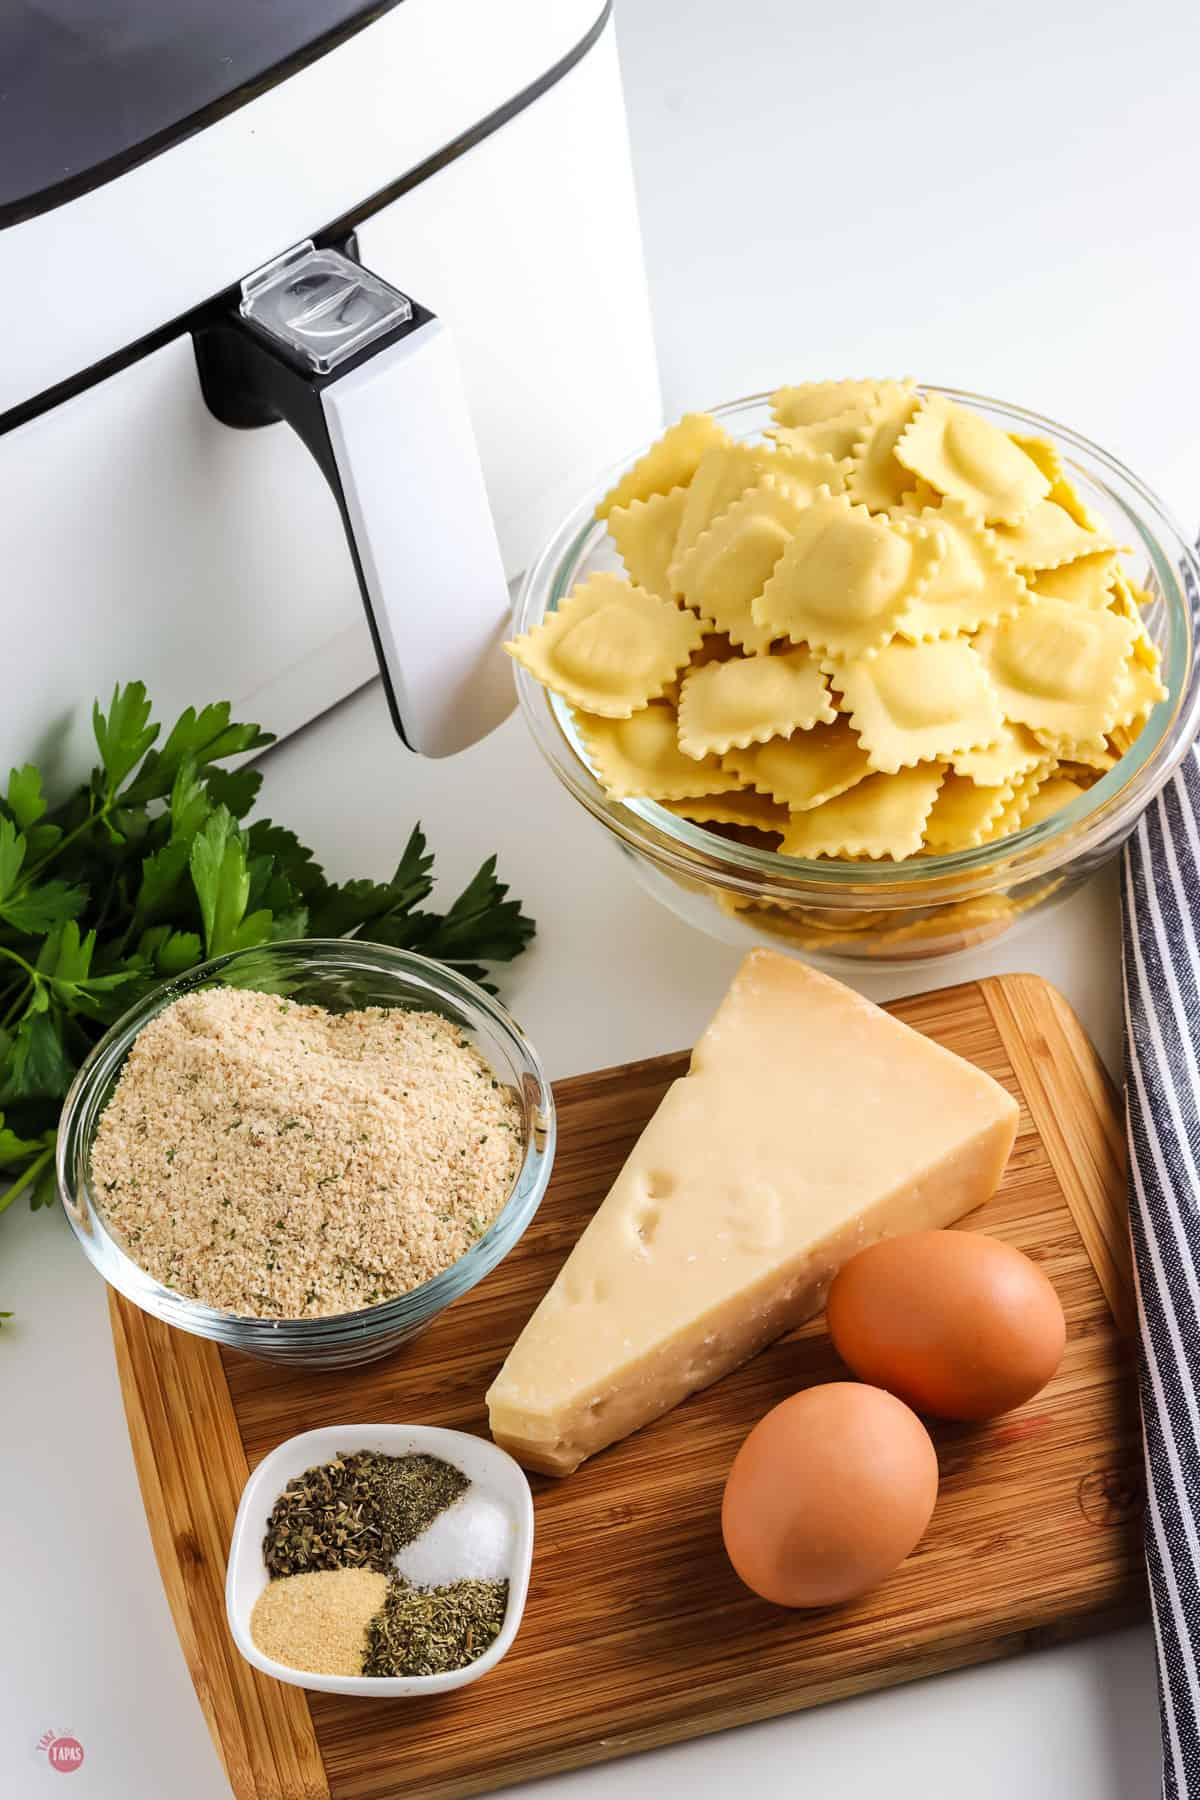 ingredients for toasted ravioli